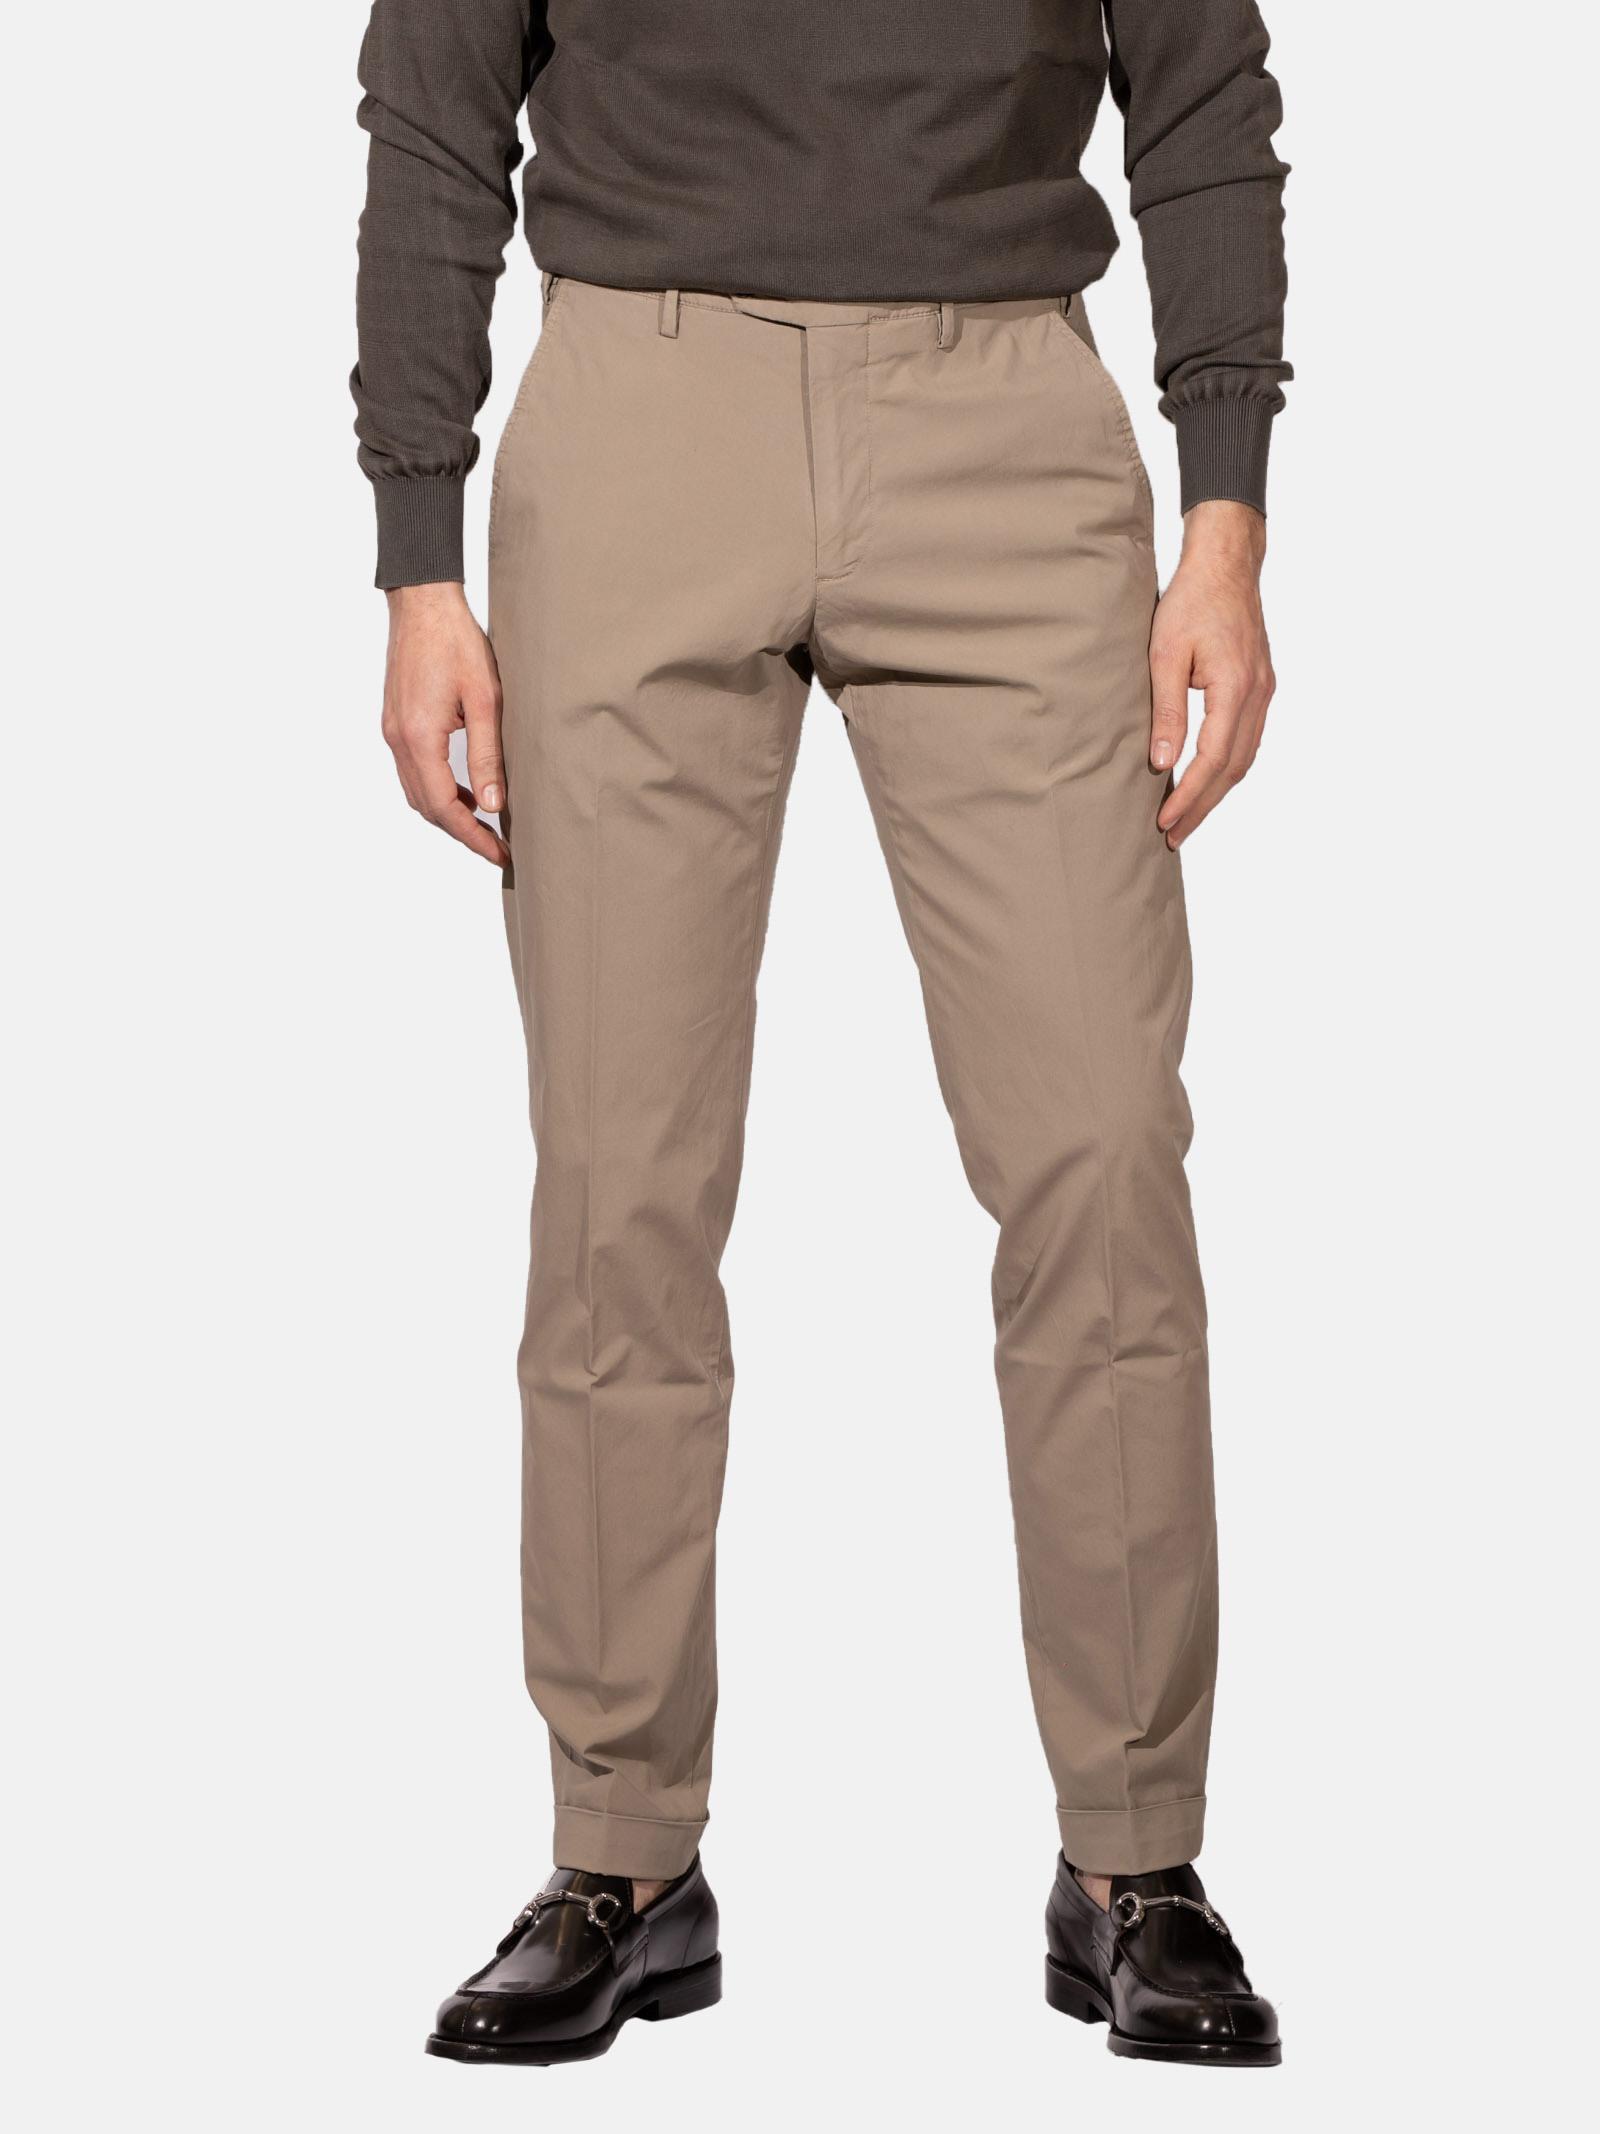 pantalone tasche america DEVORE | Pantalone | DVR3-P004518